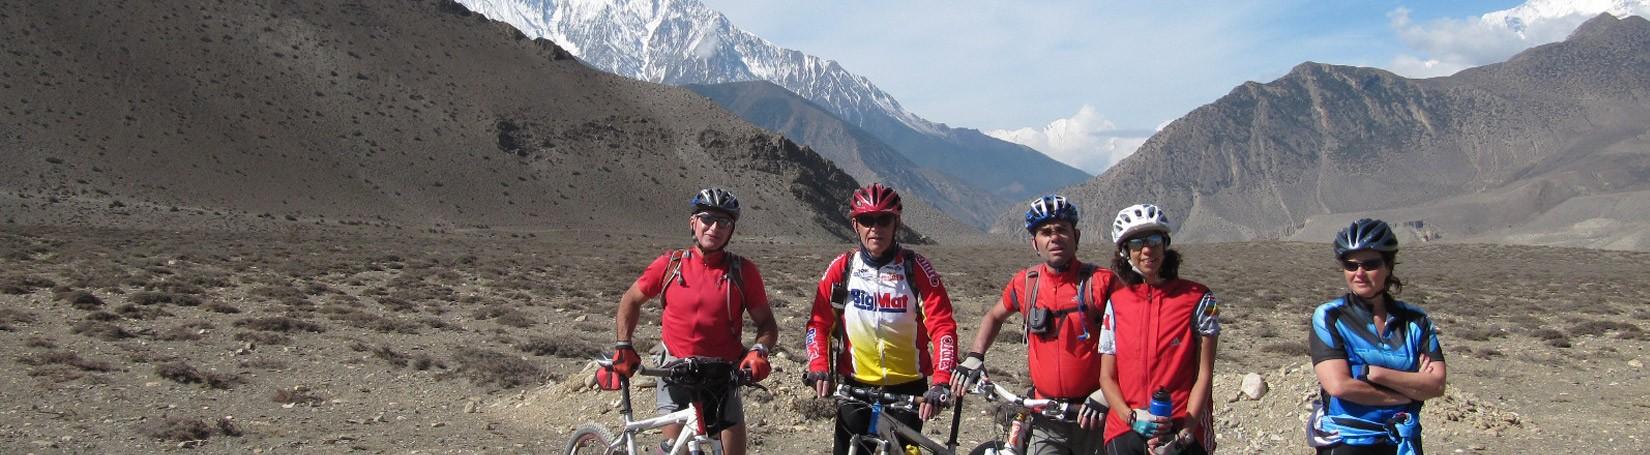 Mountain Biking in Upper Mustang